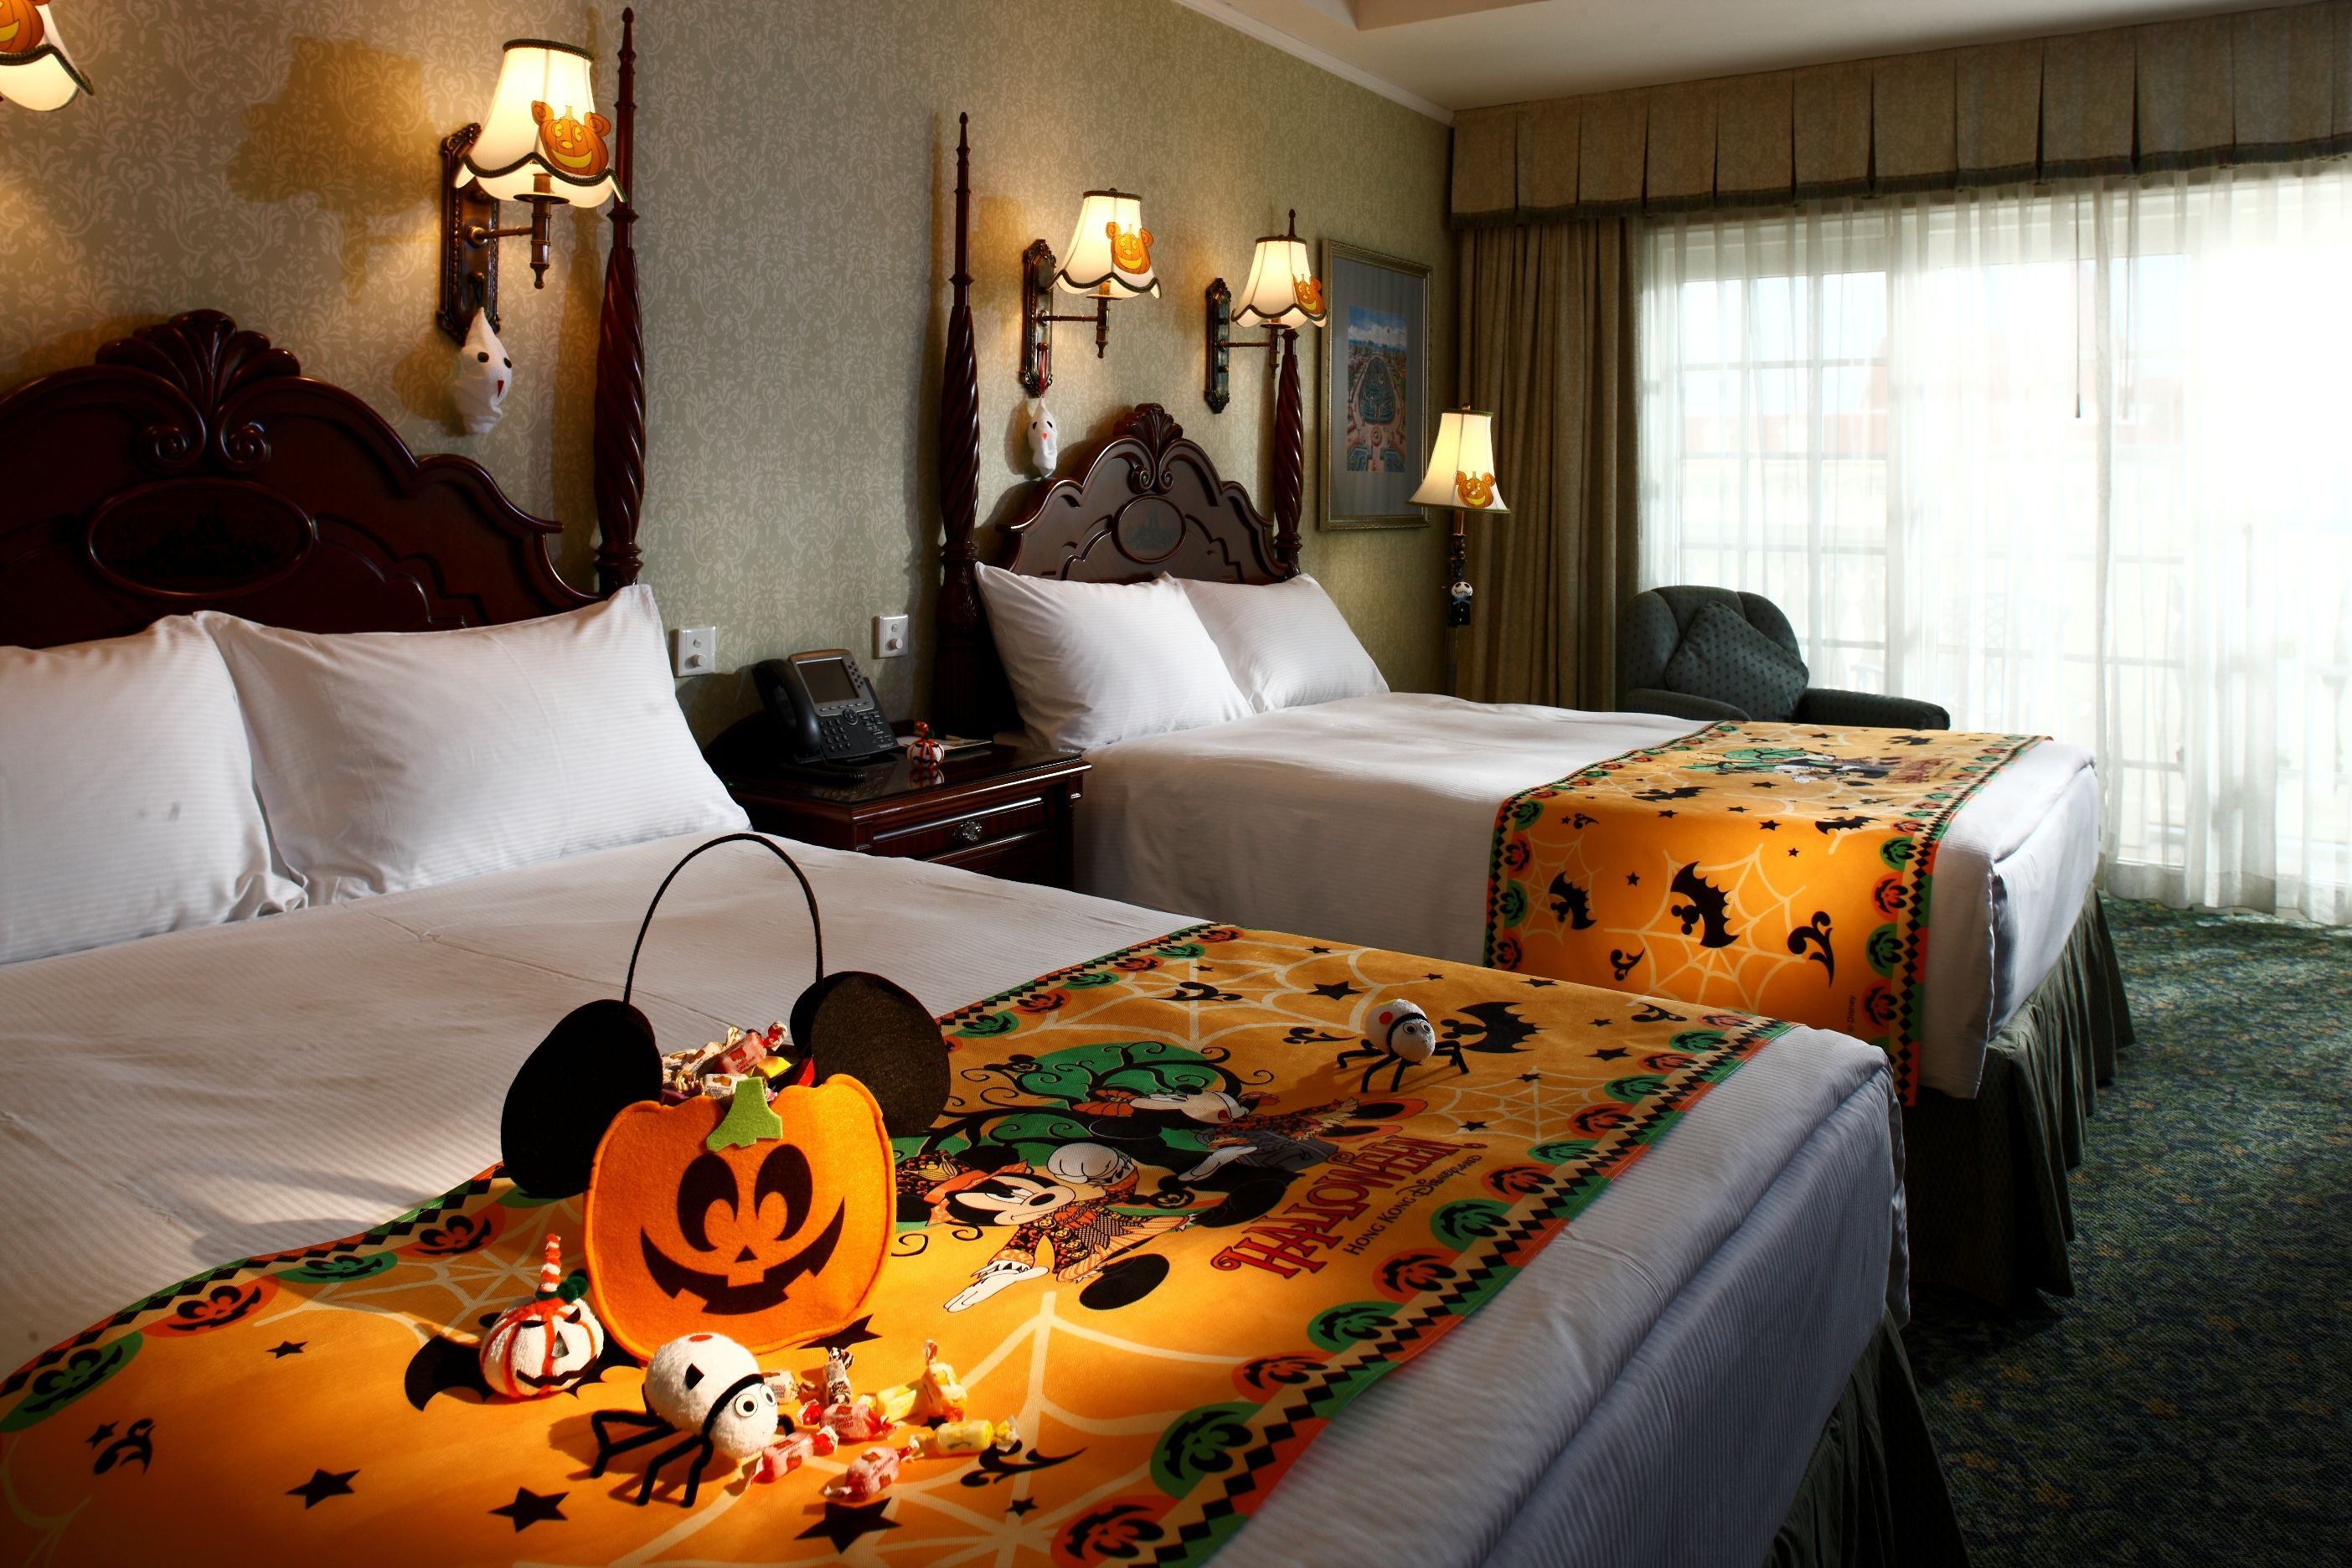 Omg Halloween Blanket & Treat Bag